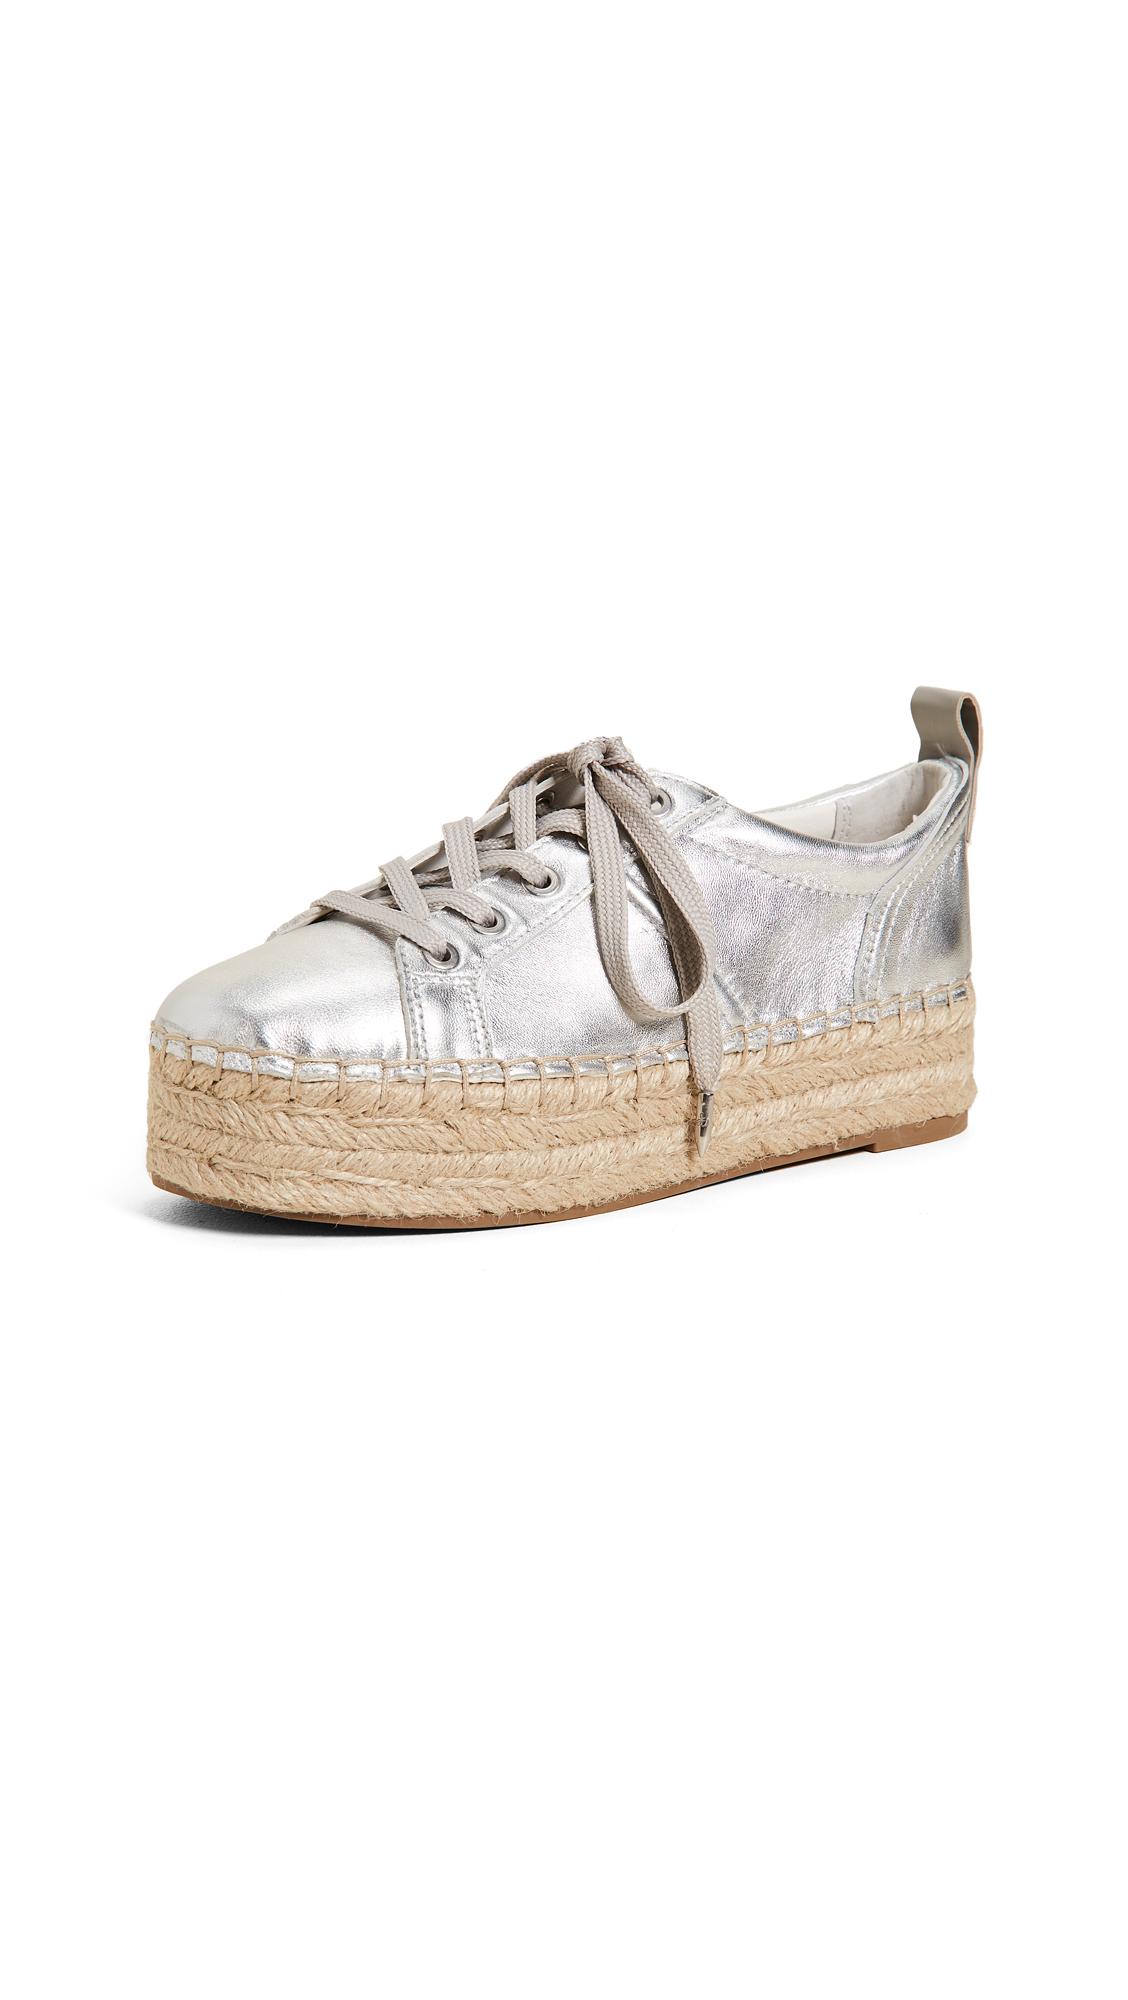 Sam Edelman Carleigh Platform Espadrille Sneakers - Soft Silver